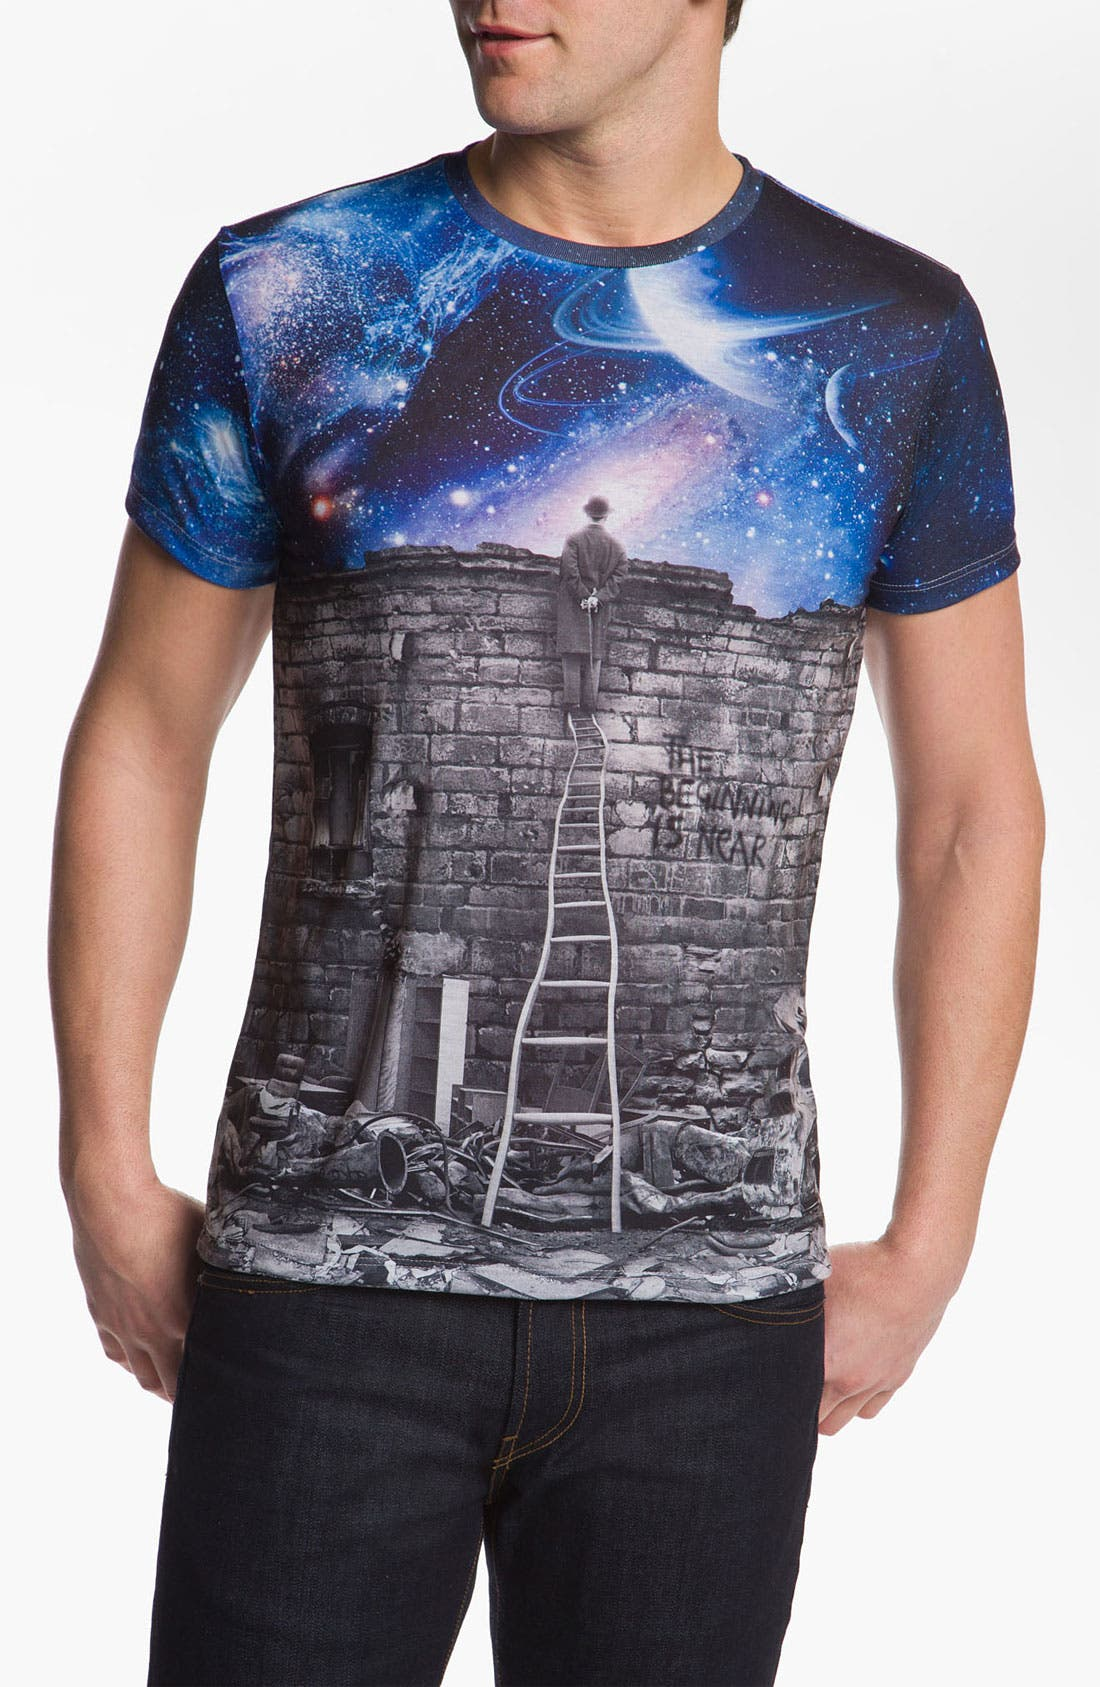 Alternate Image 1 Selected - Imaginary Foundation 'Sublimation - Beginning' T-Shirt